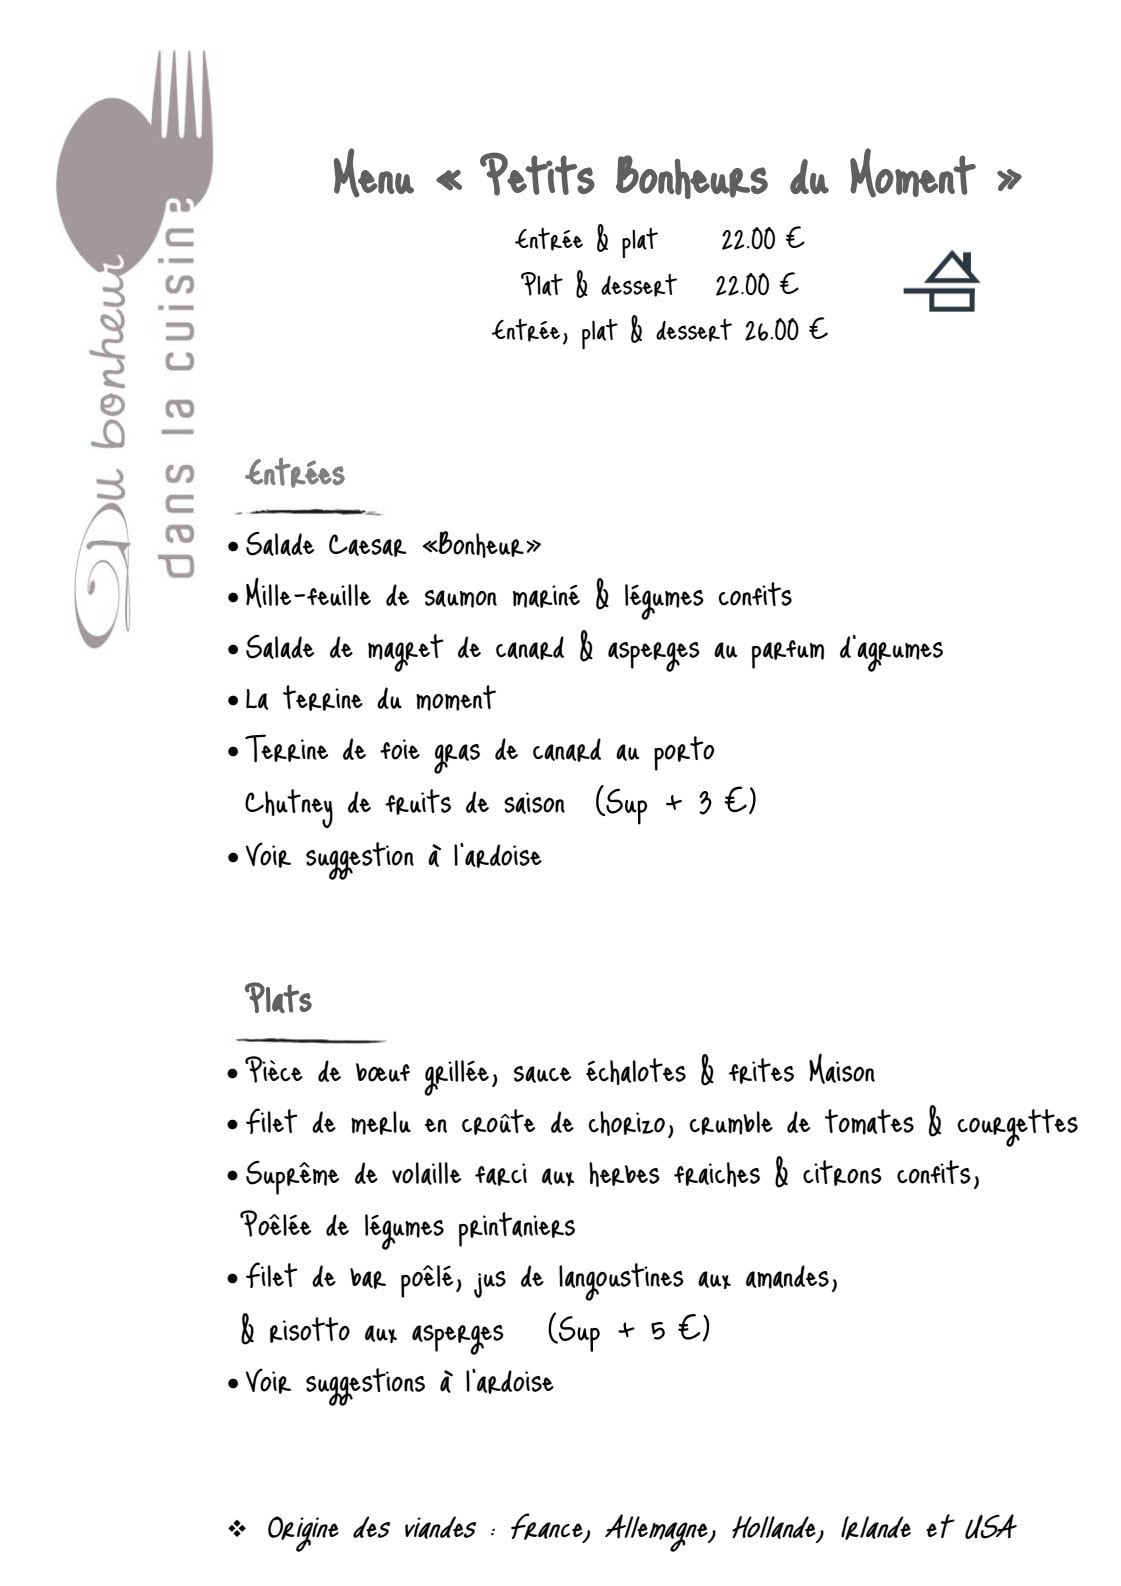 Du bonheur dans la cuisine saint herblain carte menu et photos - Du bonheur dans la cuisine saint herblain ...